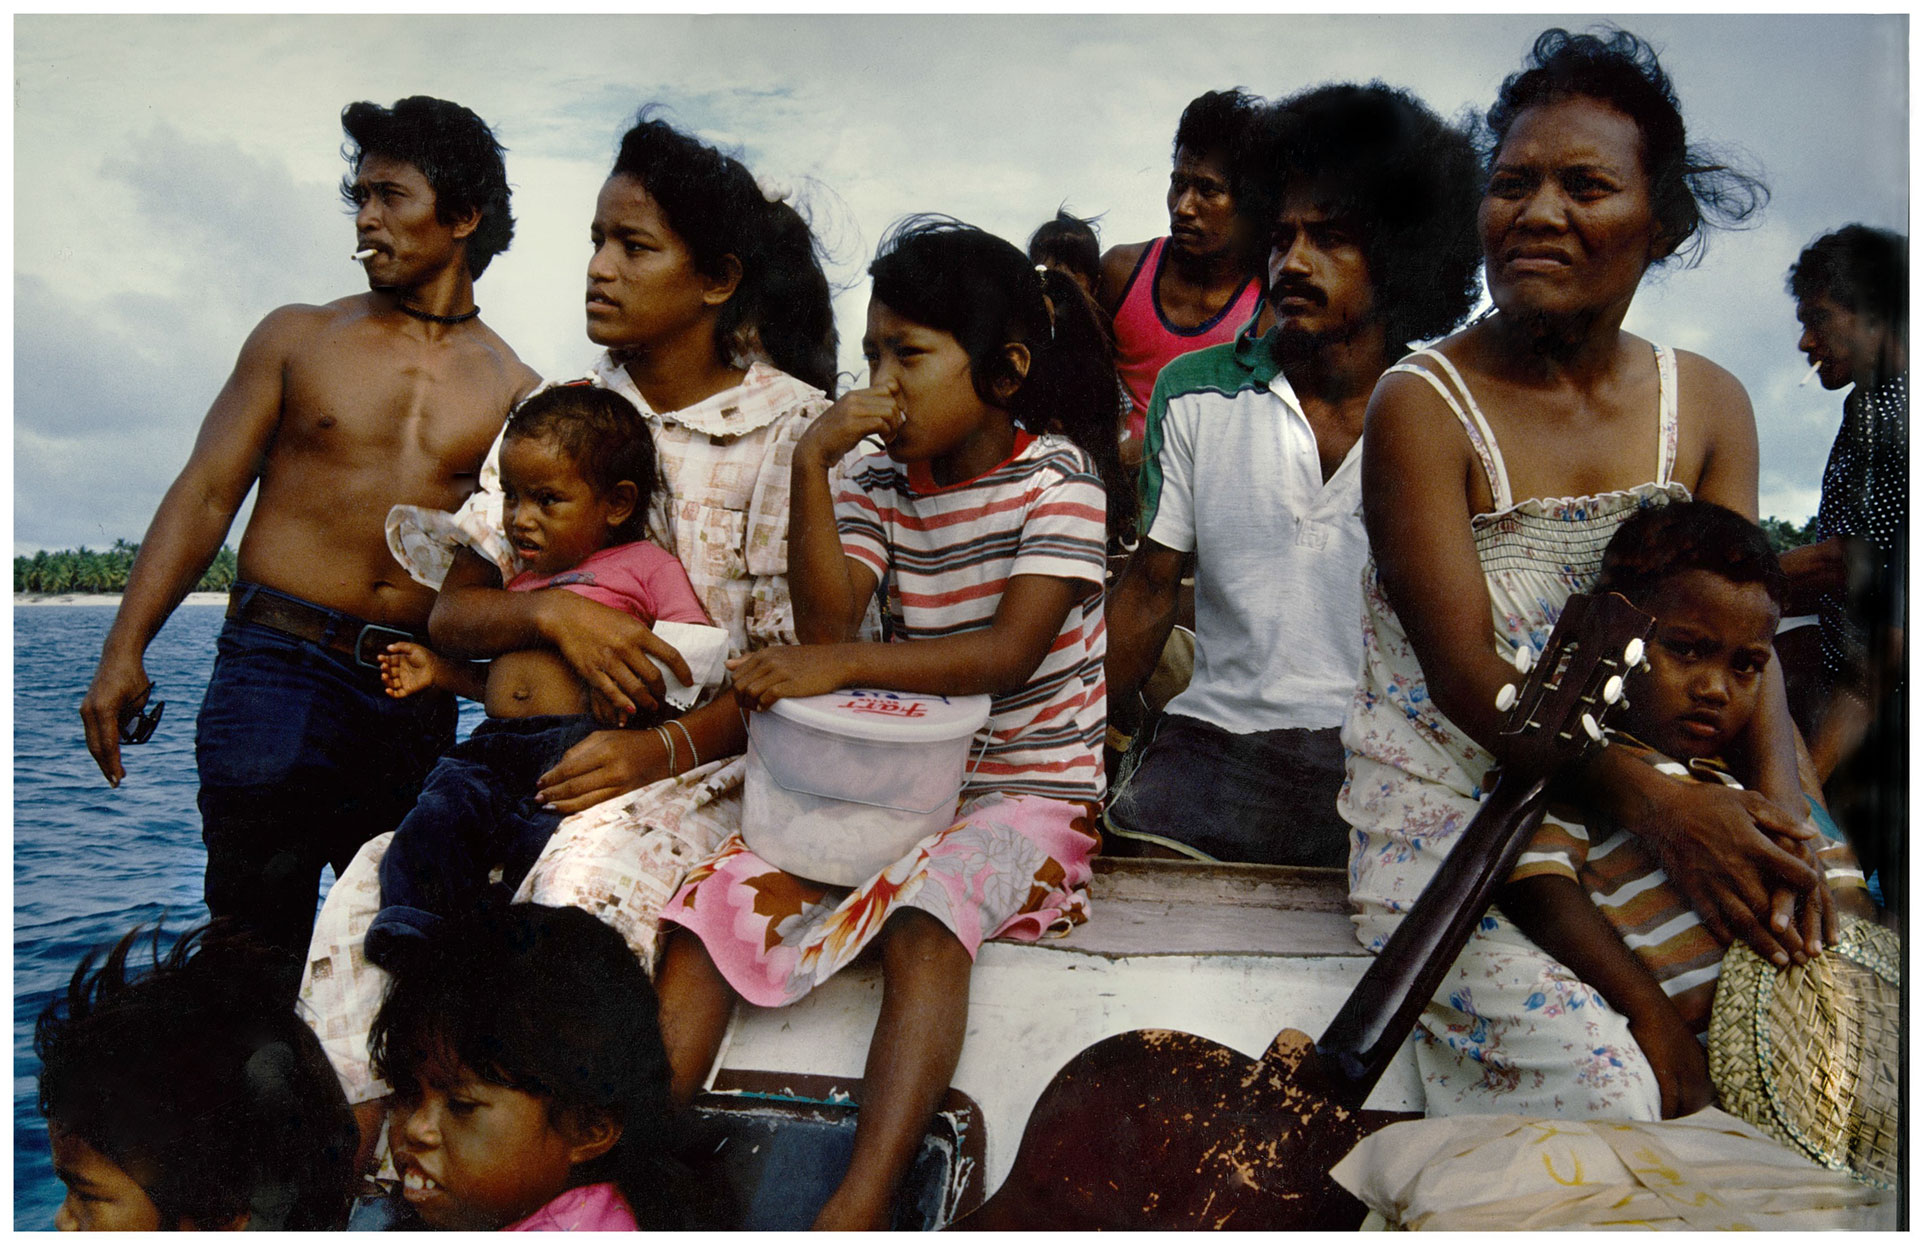 Rongelap Atoll, 1985